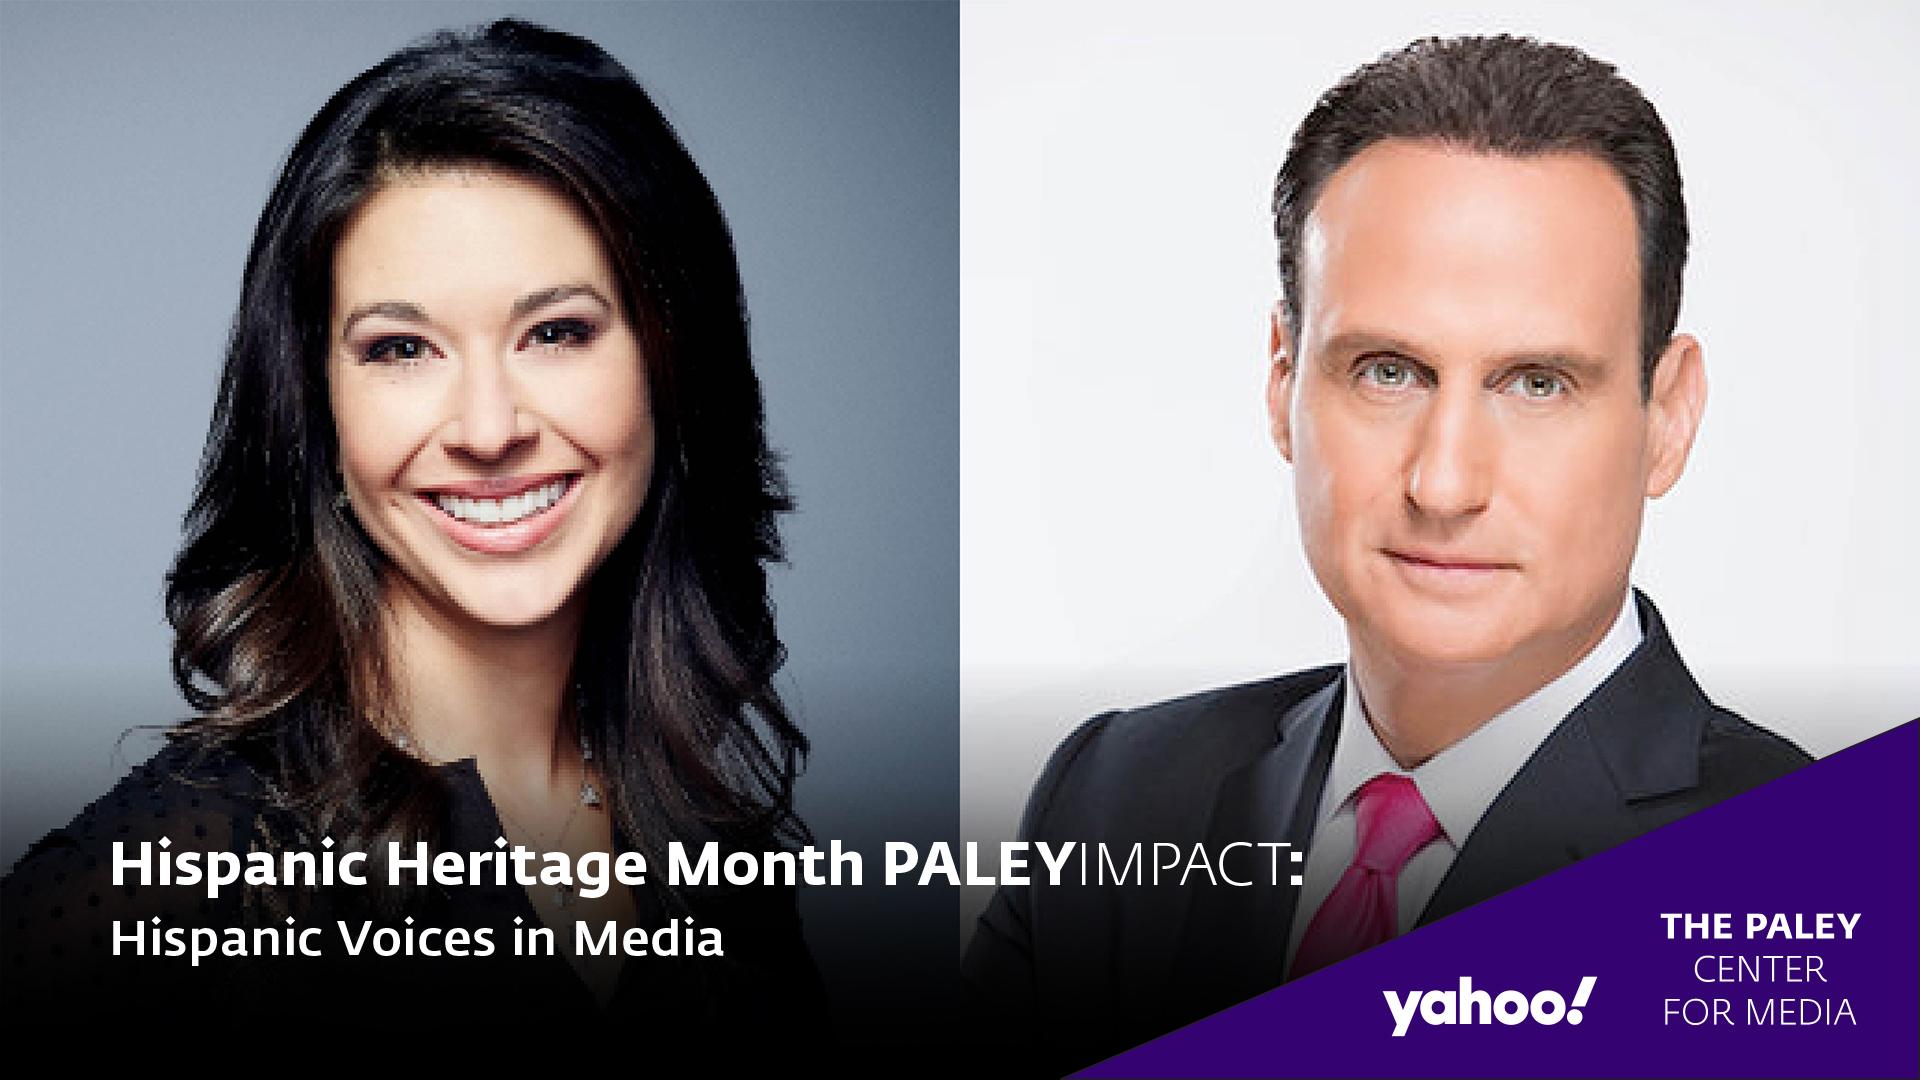 PaleyIMPACT: Hispanic Heritage Month: Hispanic Voices in Media